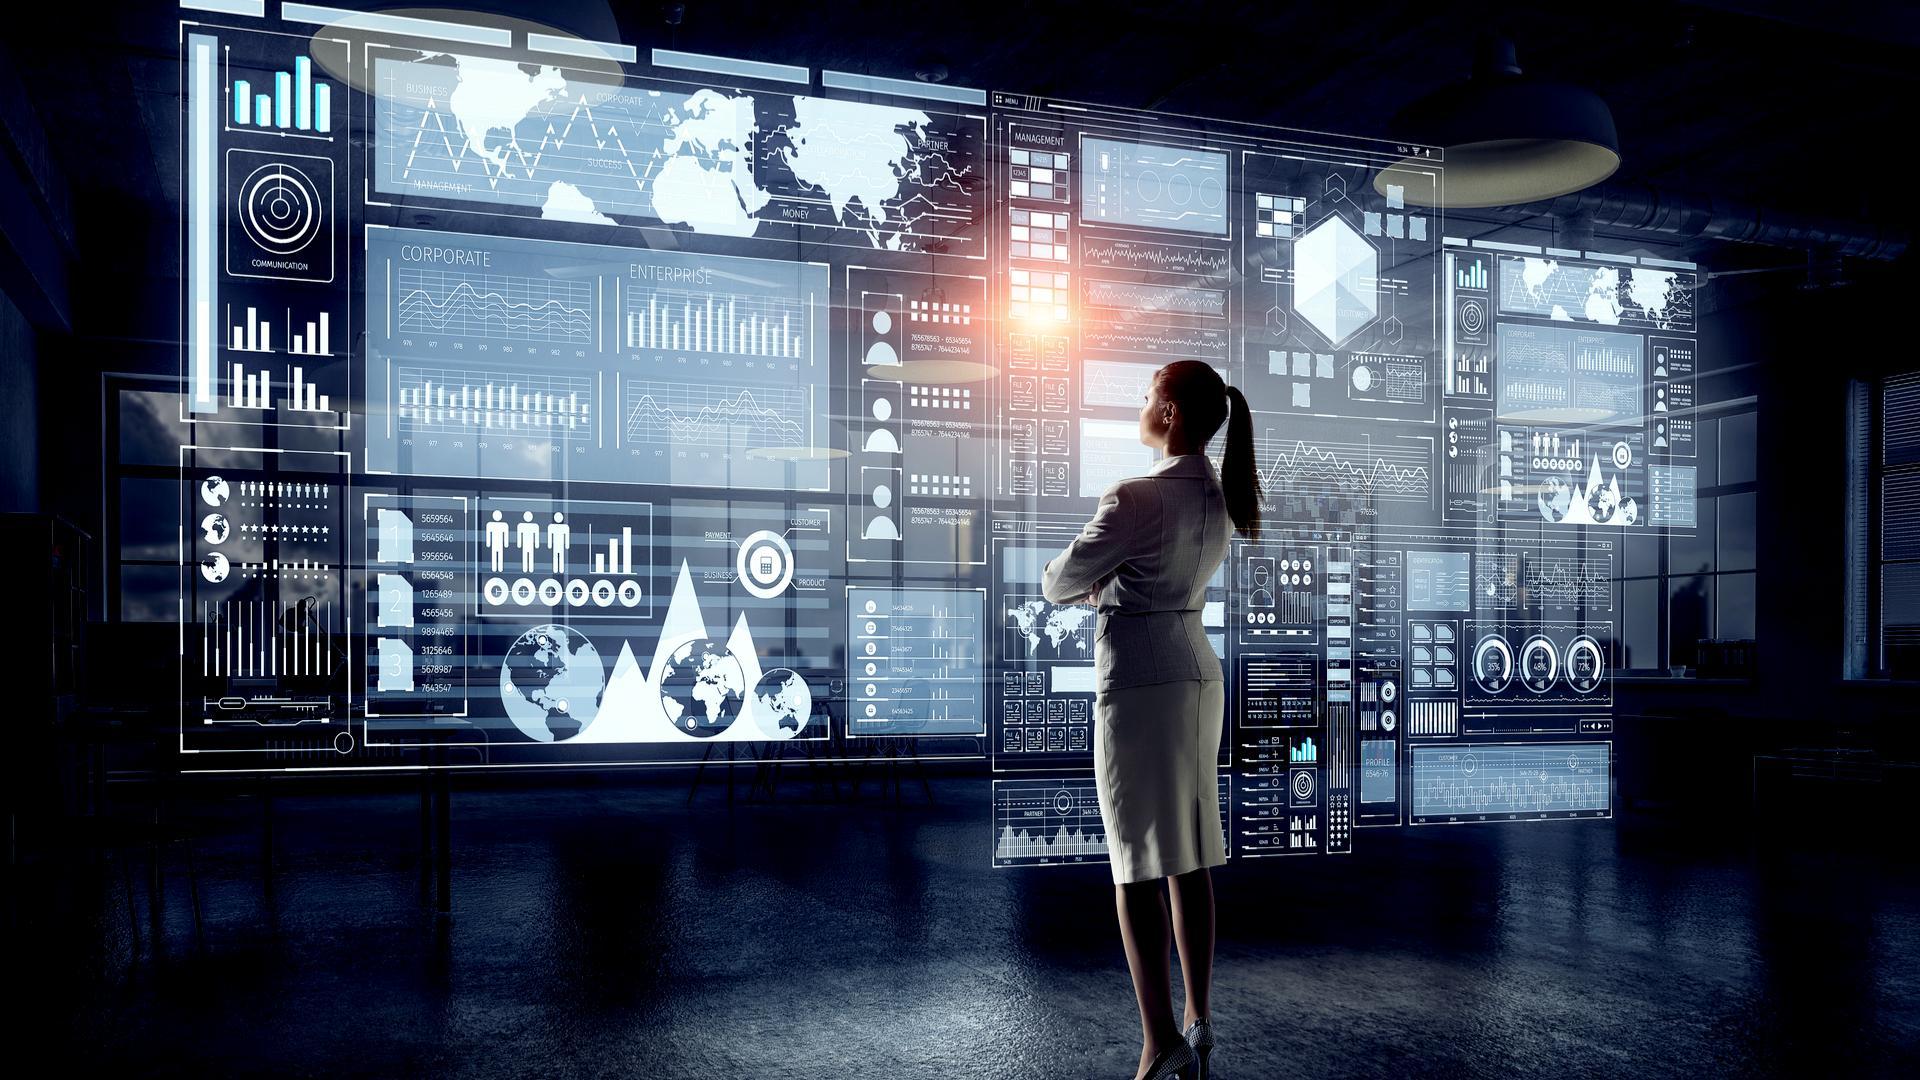 Atechup © Big Data & Analytics Entrepreneurship ™ Certification Las Vegas